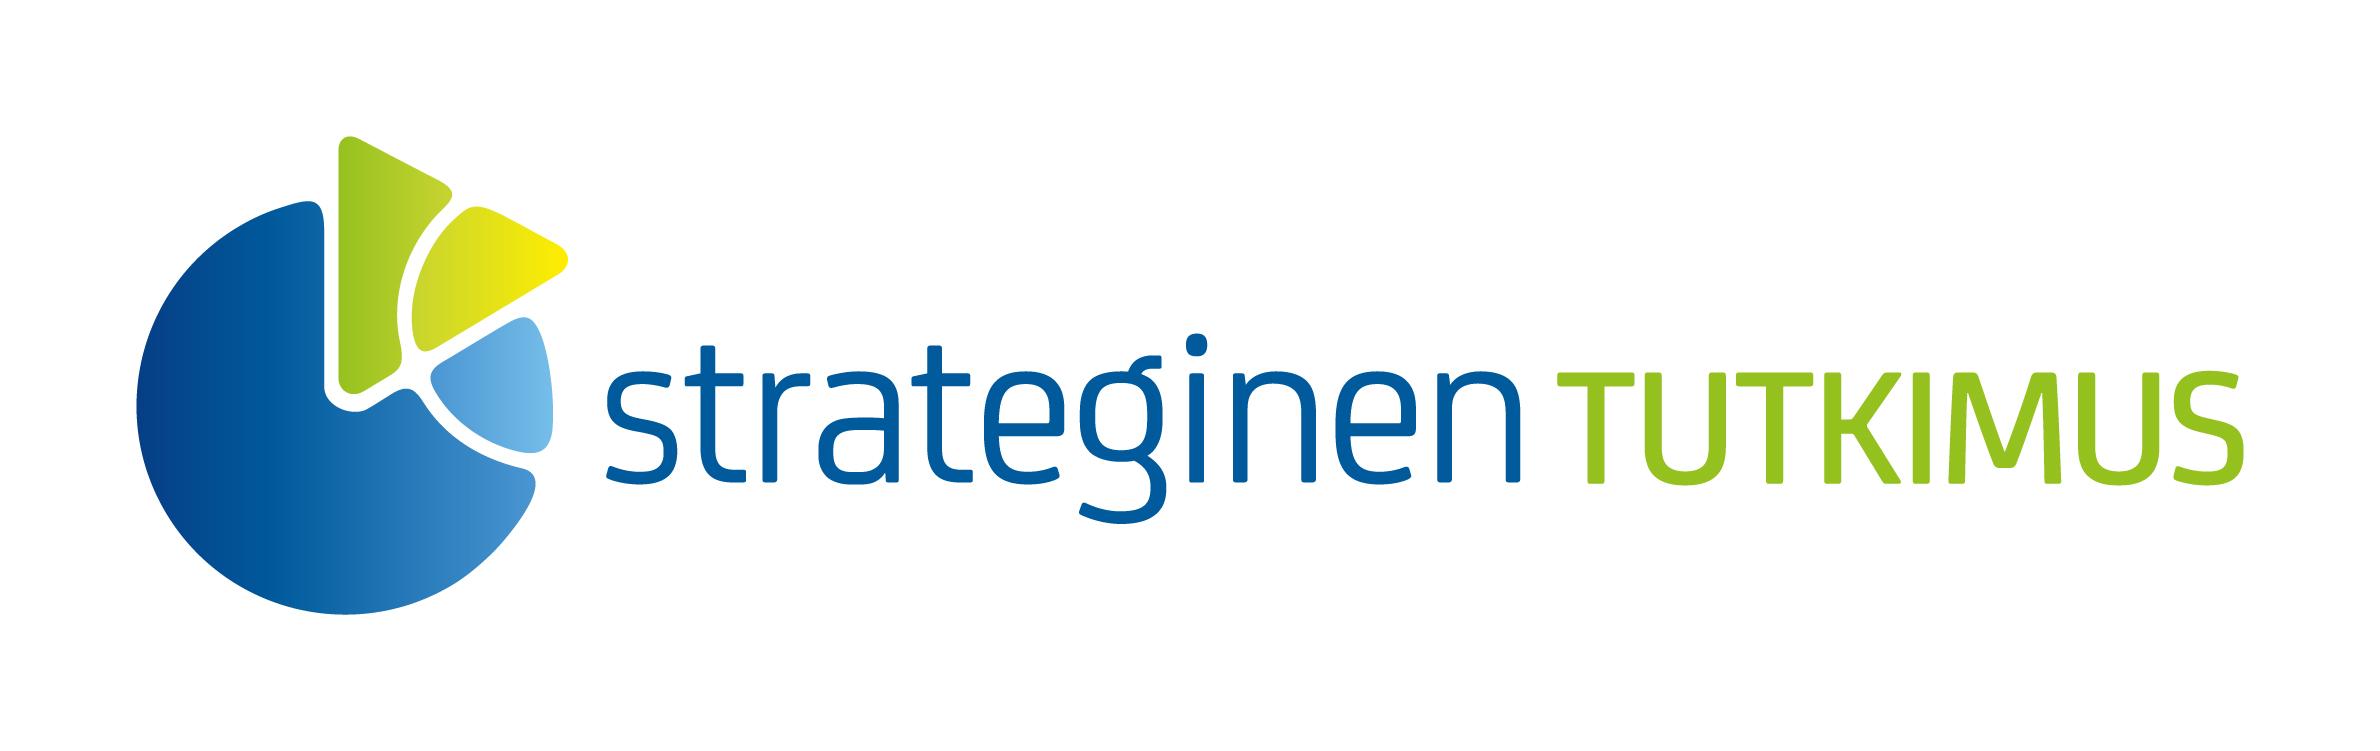 Logo Strateginen tutkimus